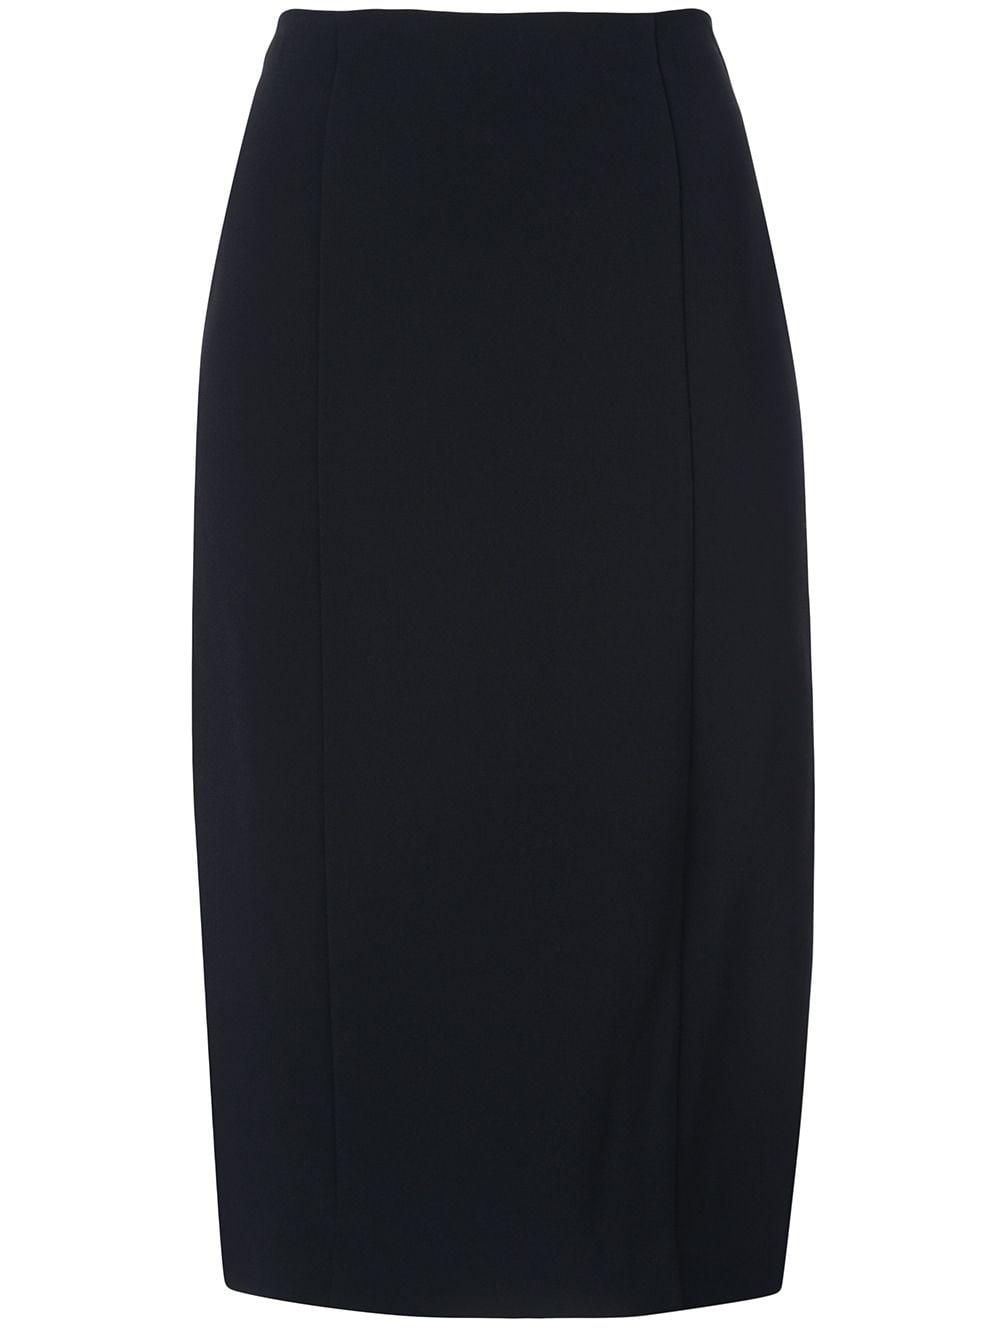 Carolina Herrera облегающая юбка-карандаш